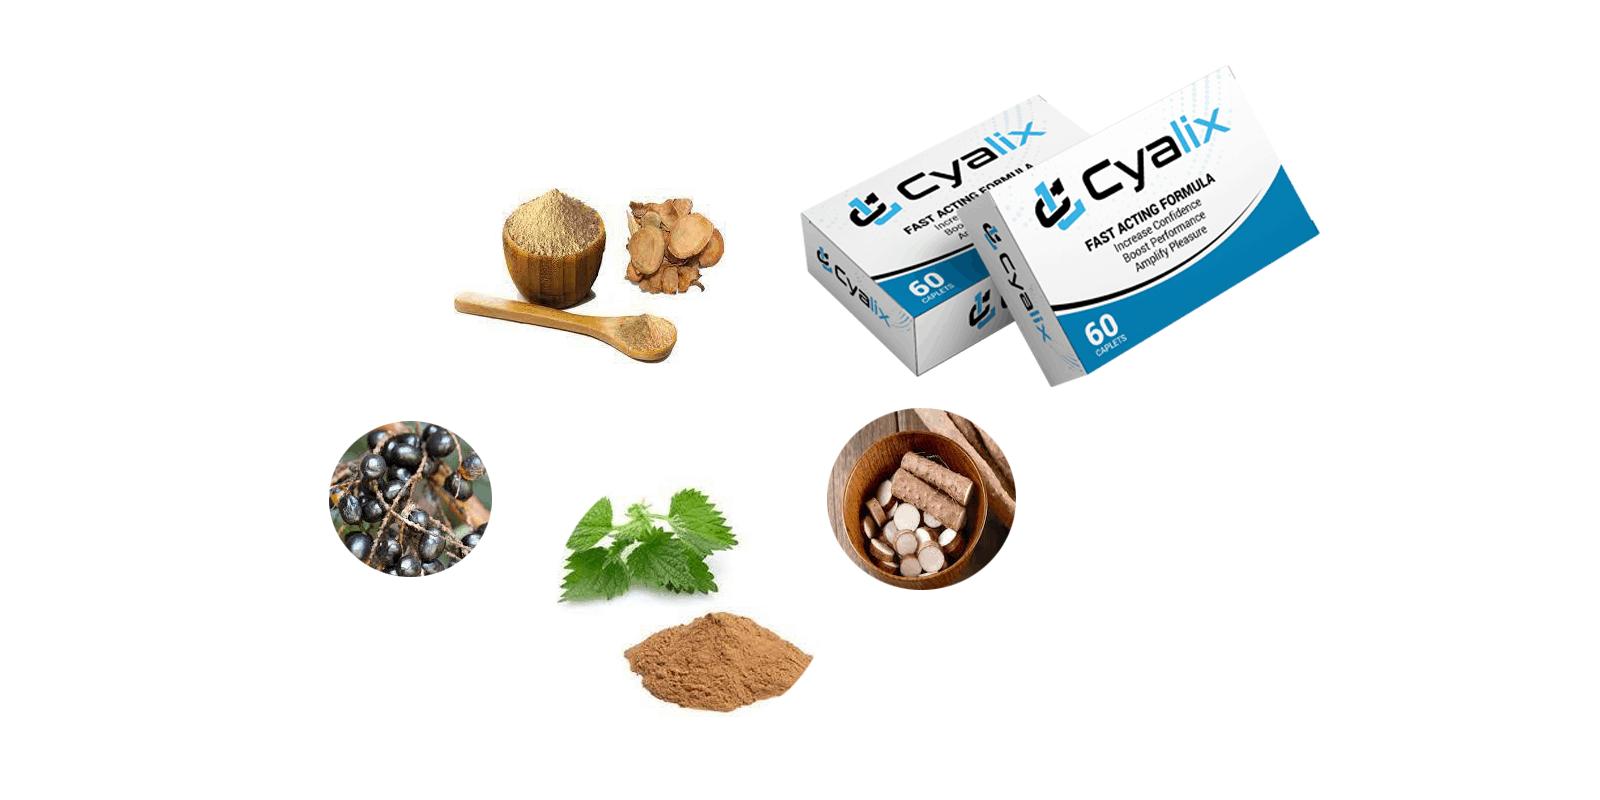 Cialix Male Enhancement ingredients